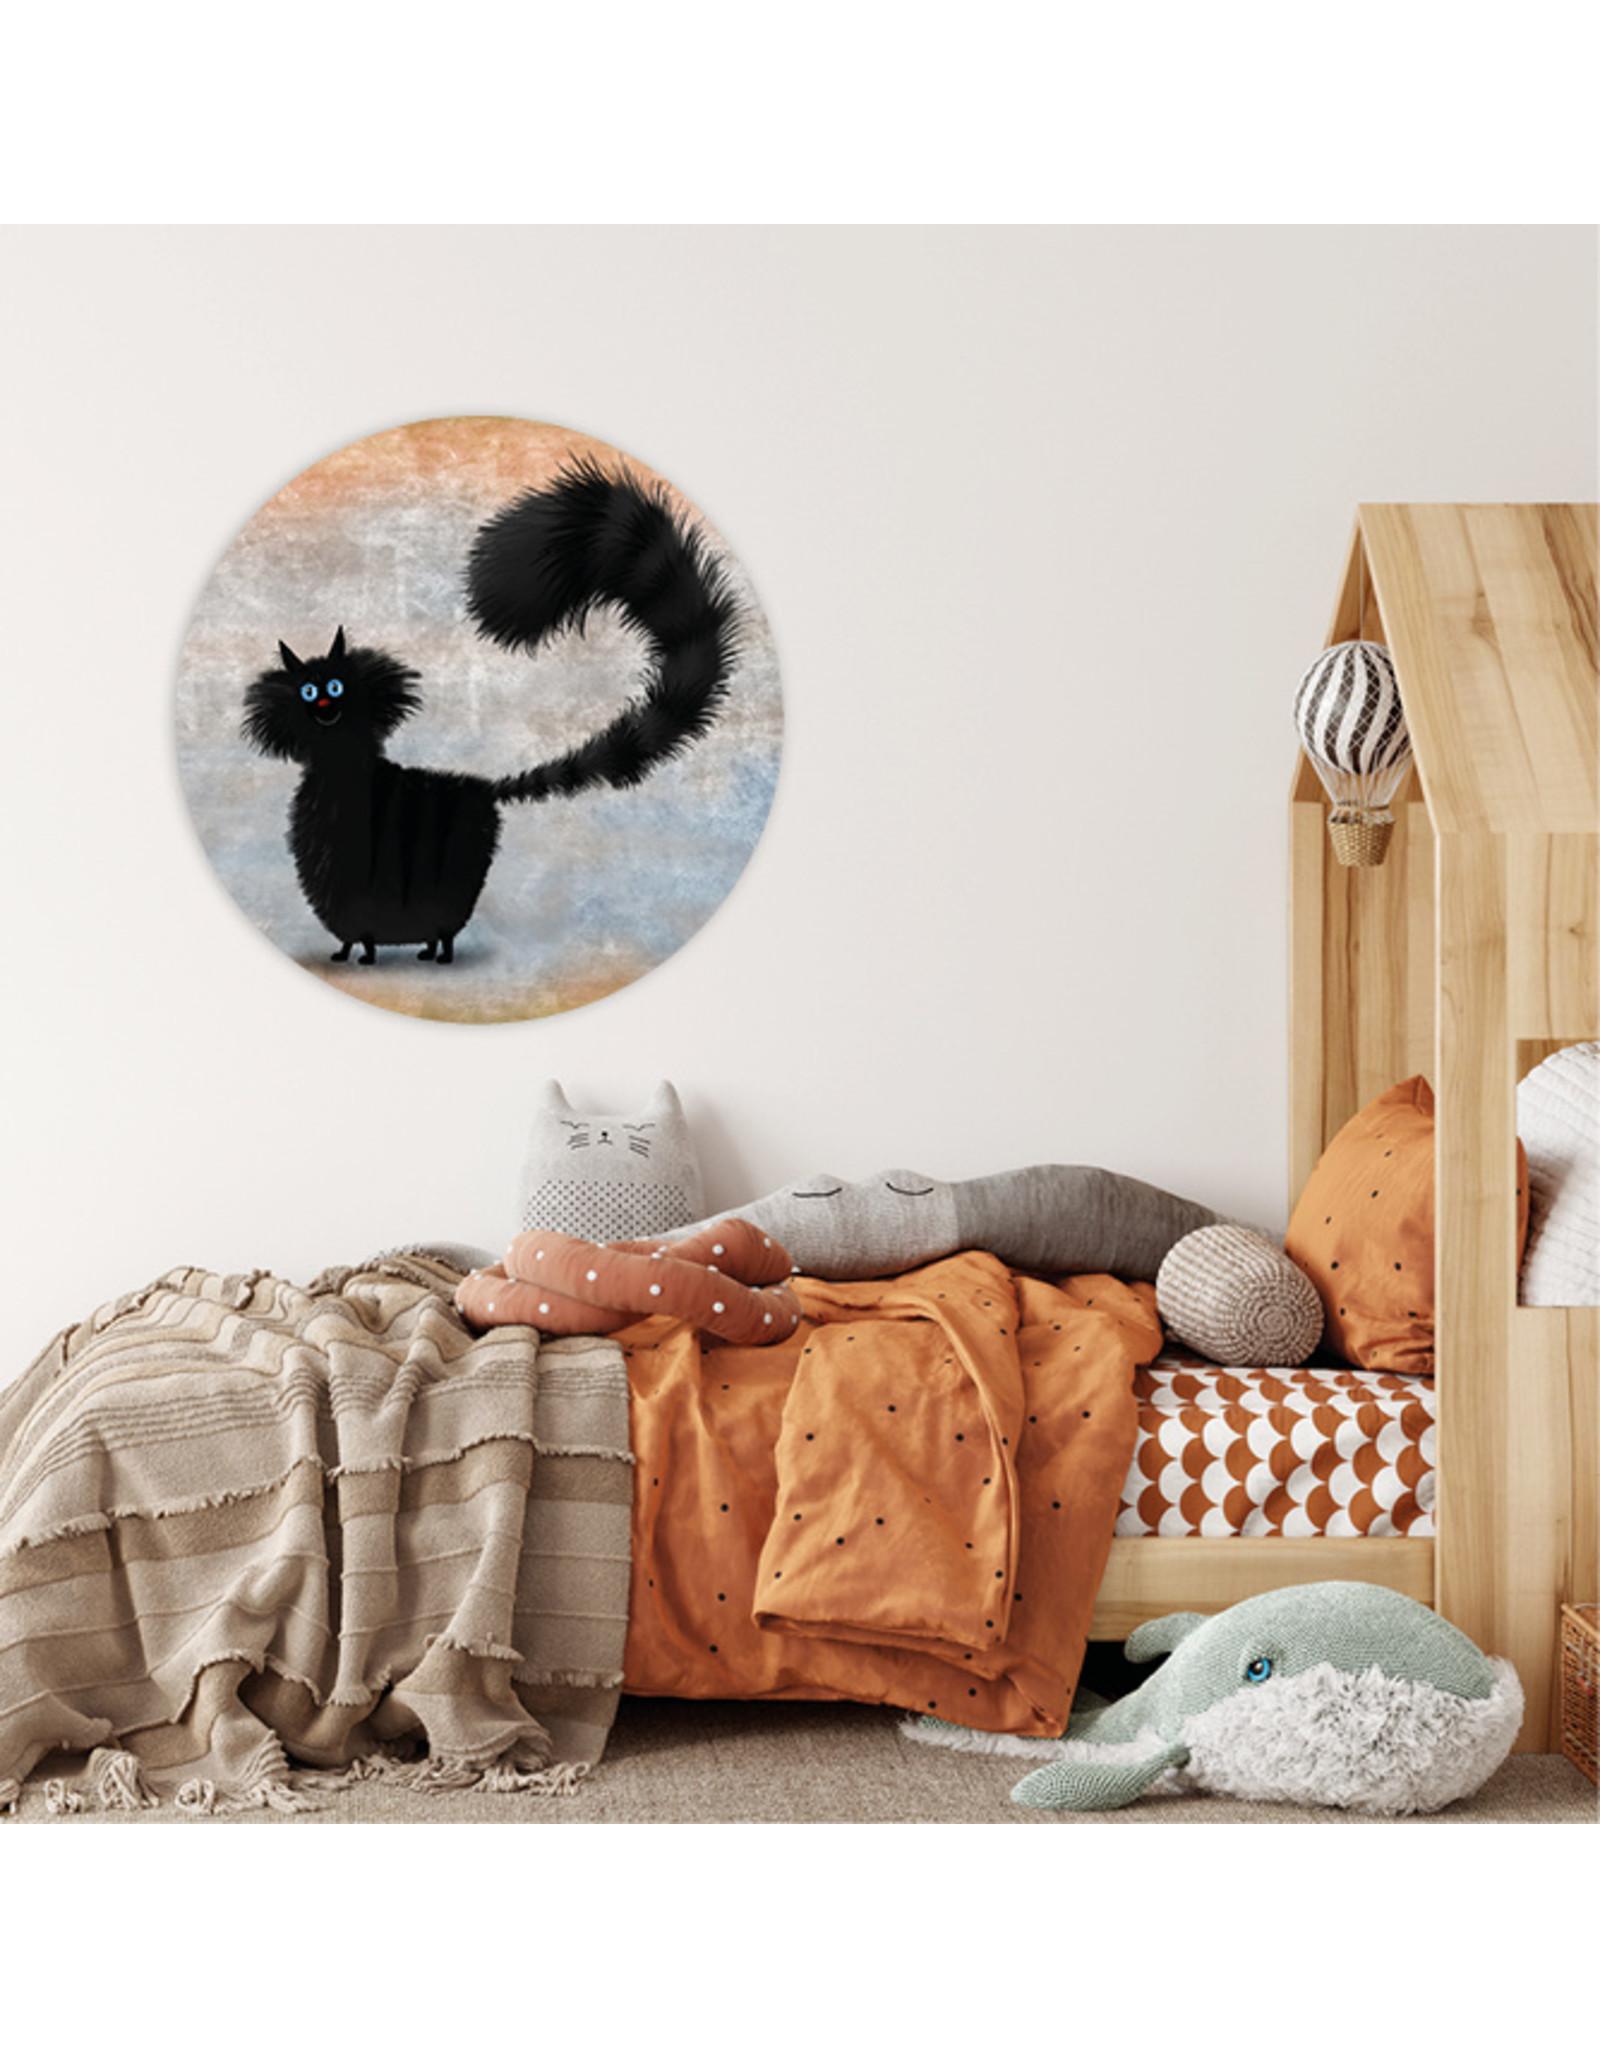 Dunnebier Home Muursticker Black Cat_No3 - verwijderbaar